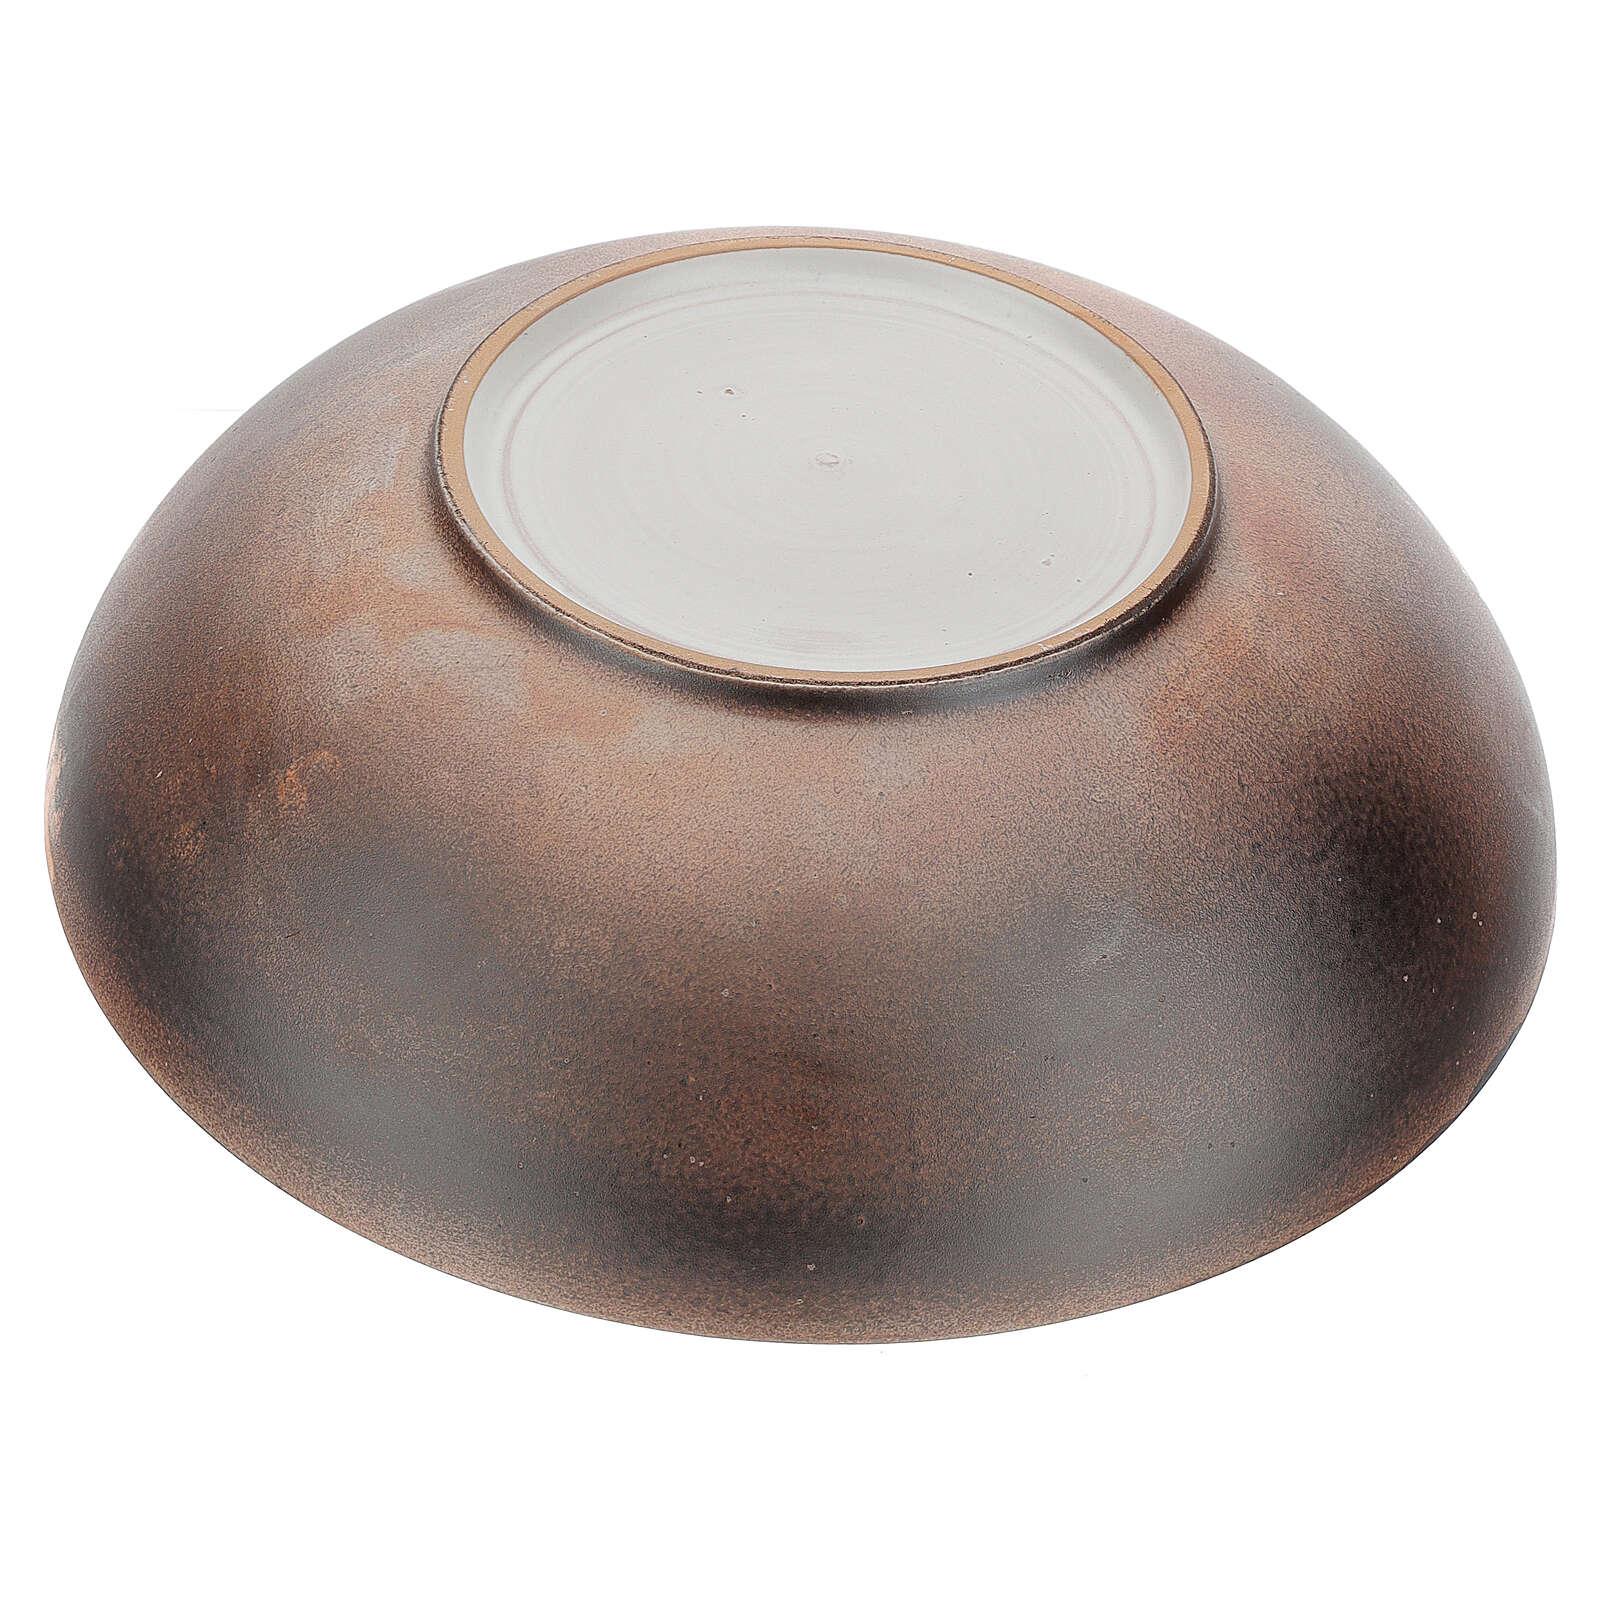 STOCK Piatto brocca concavo ceramica Pompei 30 cm 3